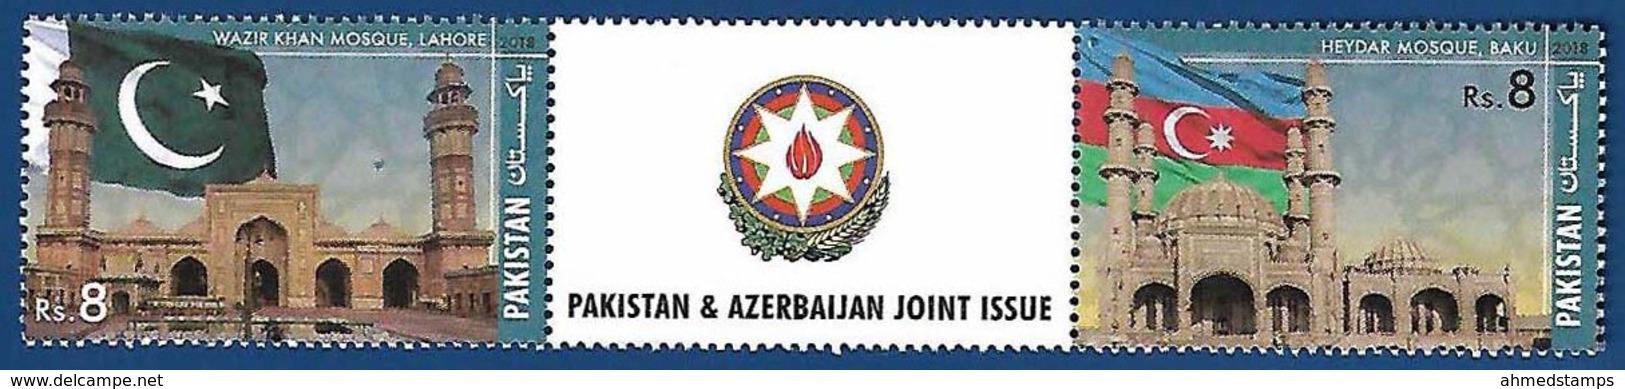 PAKISTAN MNH 2018 JOINT ISSUE WITH AZERBAIJAN FLAG - Pakistan